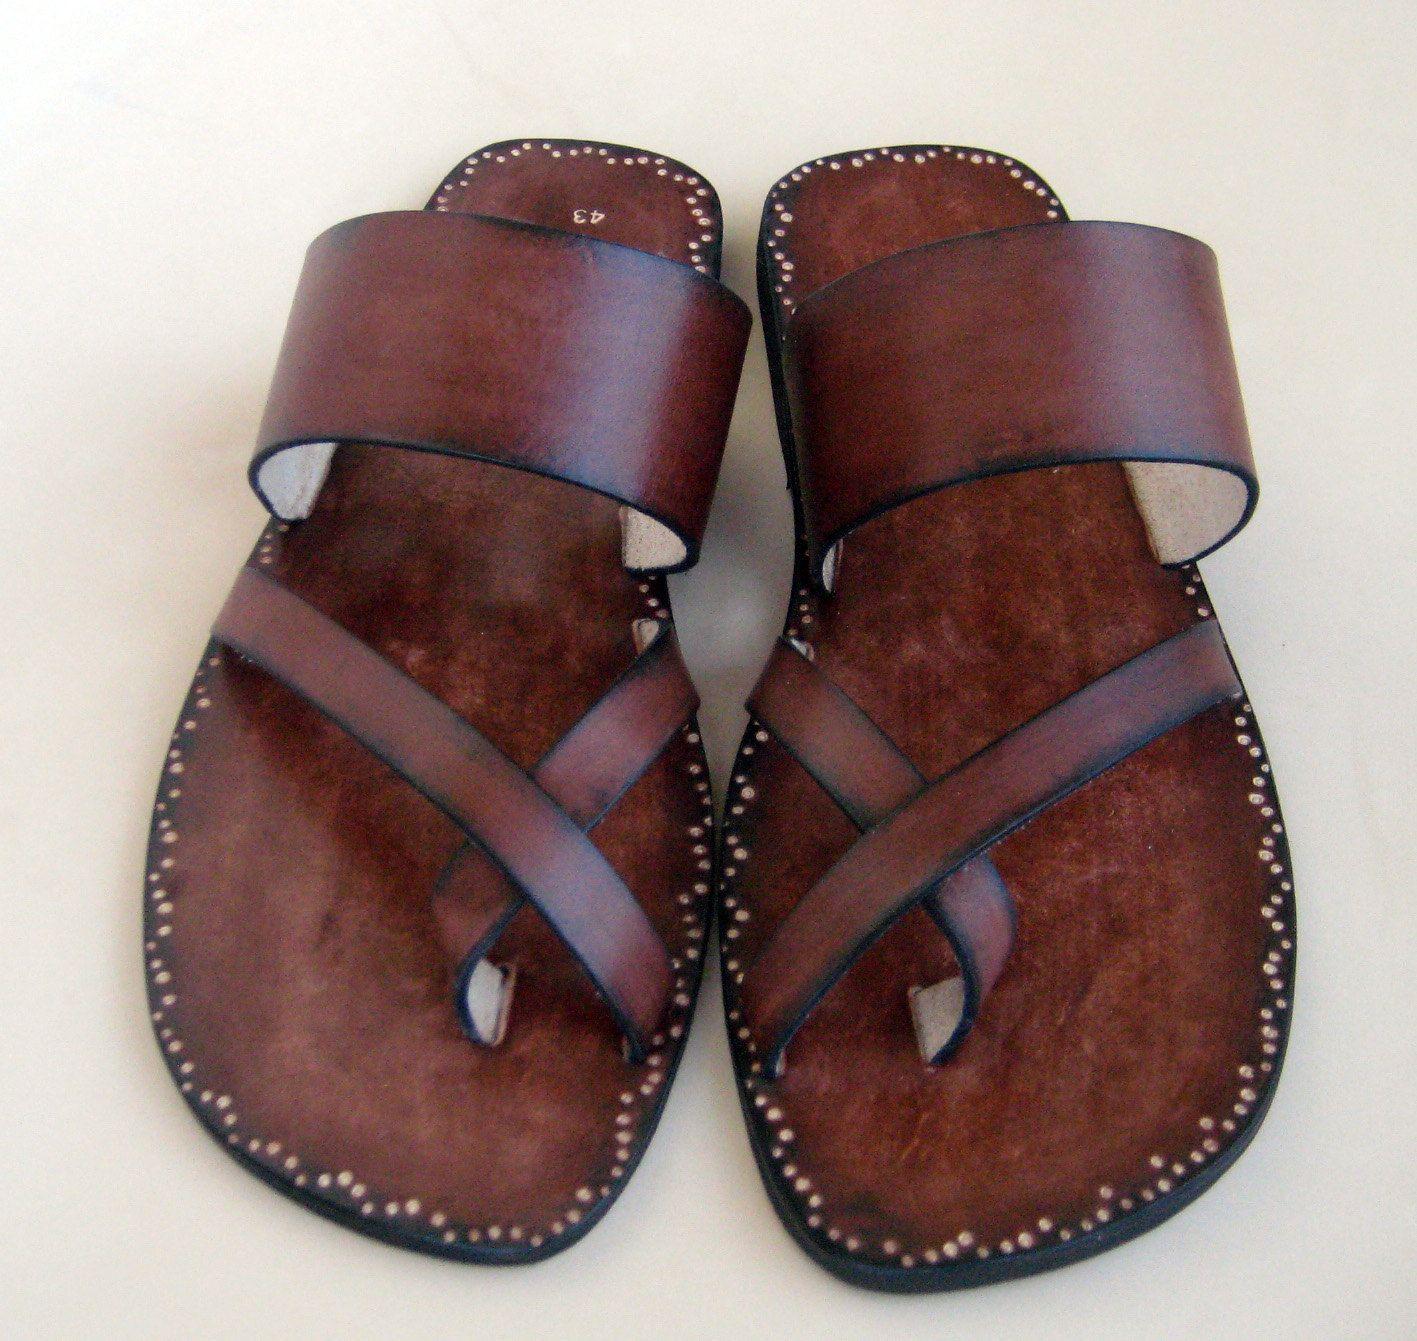 Womens sandals etsy - Men Sandals Leather Valor By Calpas On Etsy 70 00